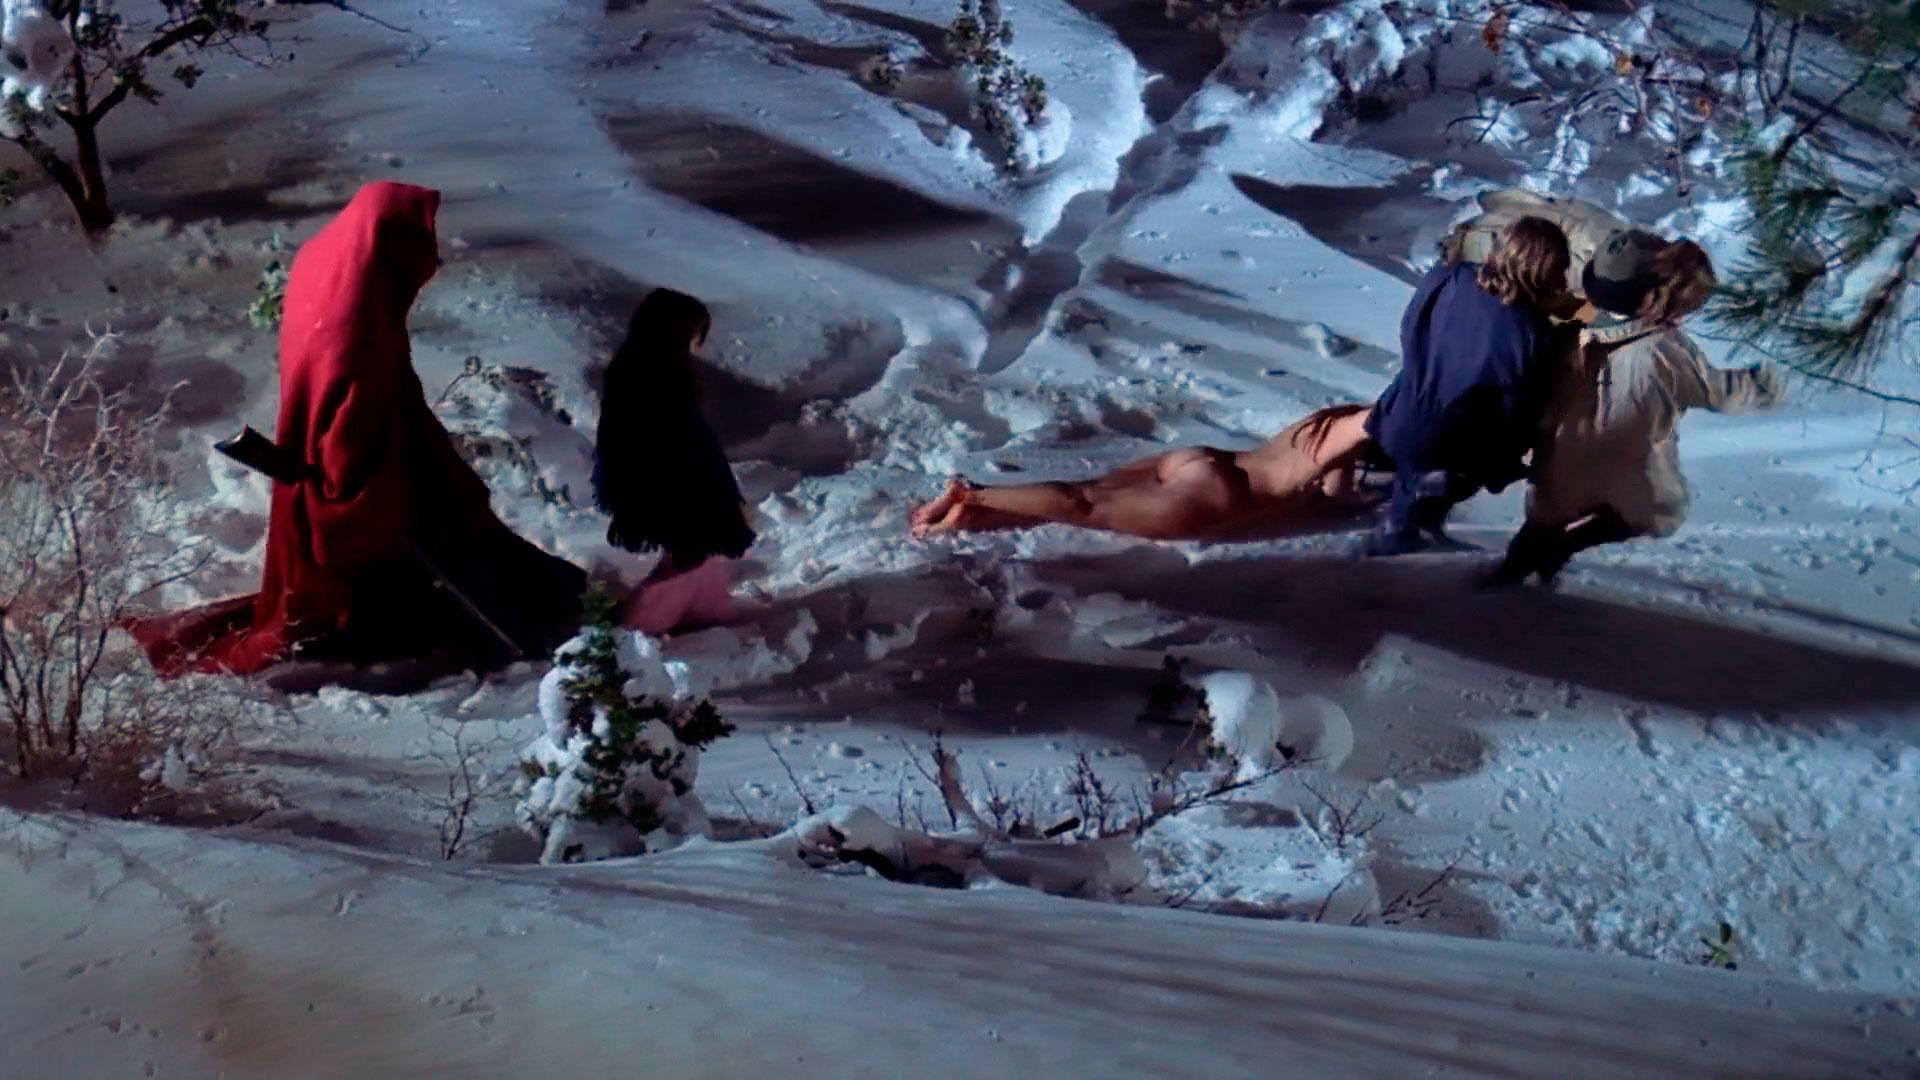 Дьявол отсчитал пять / Devil Times Five / Peopletoys / The Horrible House On The Hill (1974 Шон МакГрегор, Дэвид Шелдон)